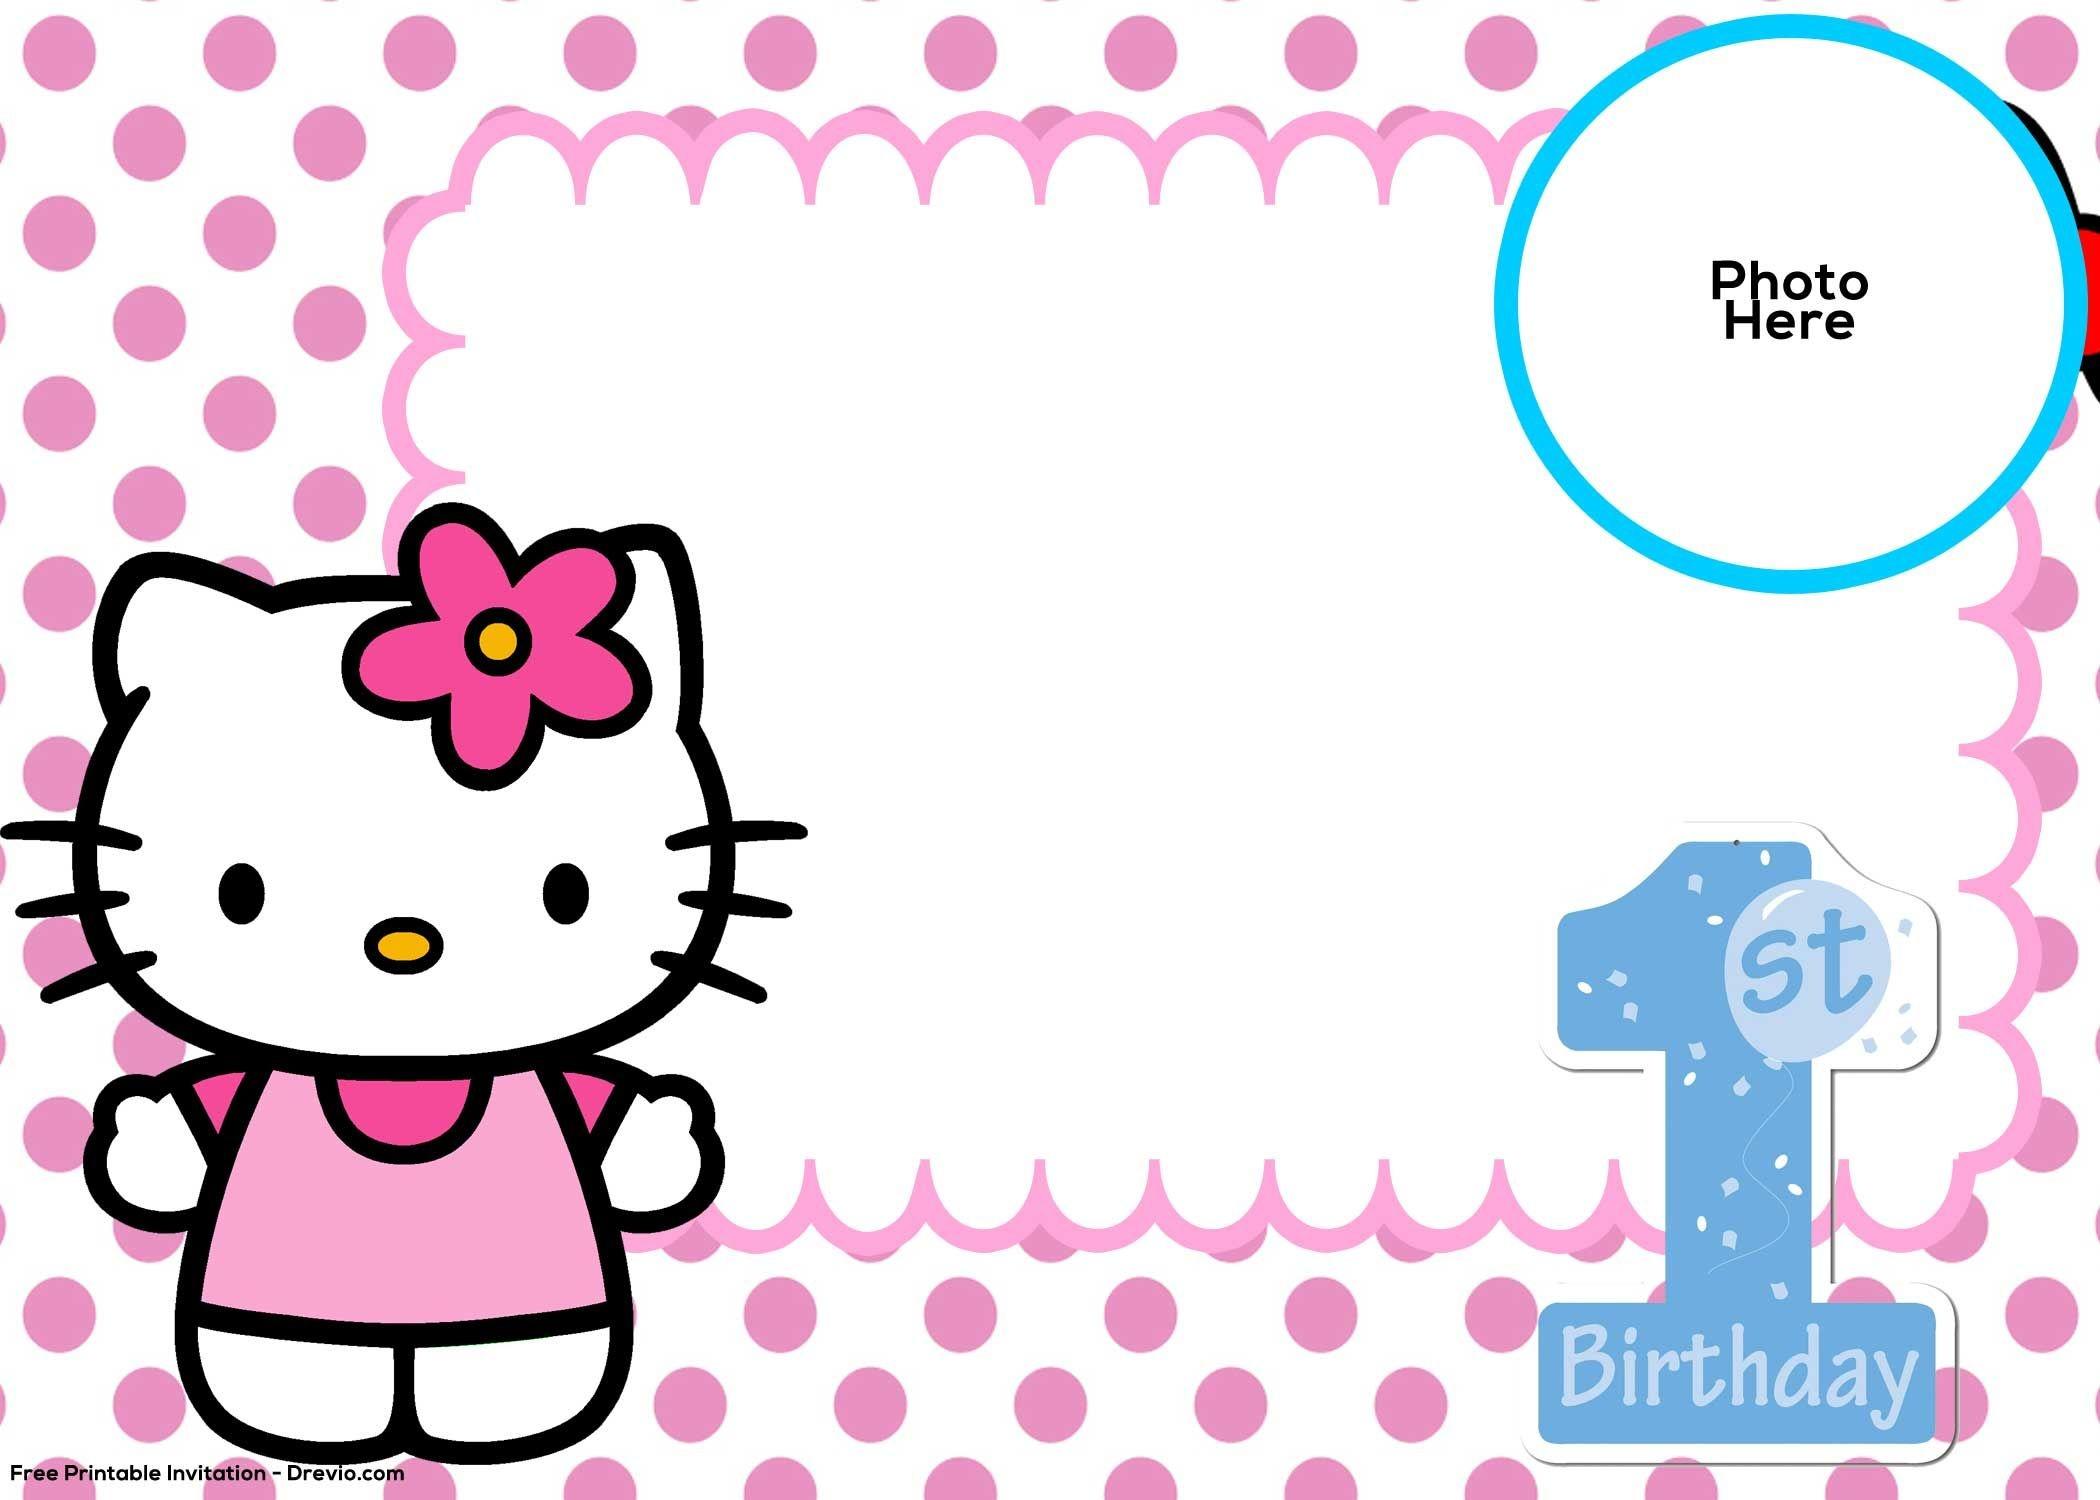 Free Hello Kitty 1St Birthday Invitation Template | Hello Kitty - Hello Kitty Free Printable Invitations For Birthday